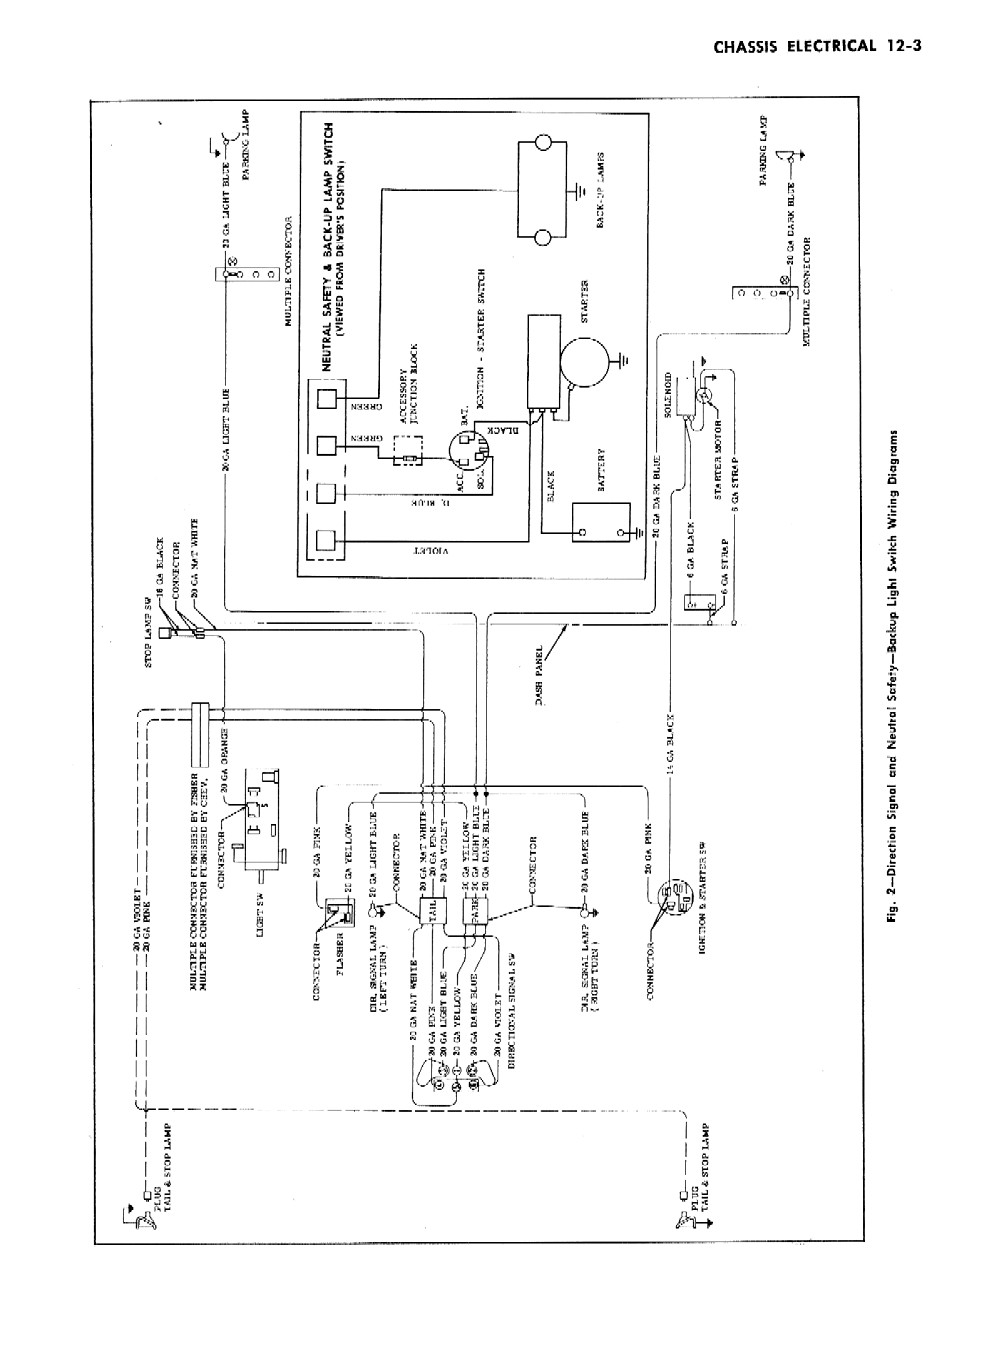 1957 Chevy Truck Wiring Diagram - Roslonek.net